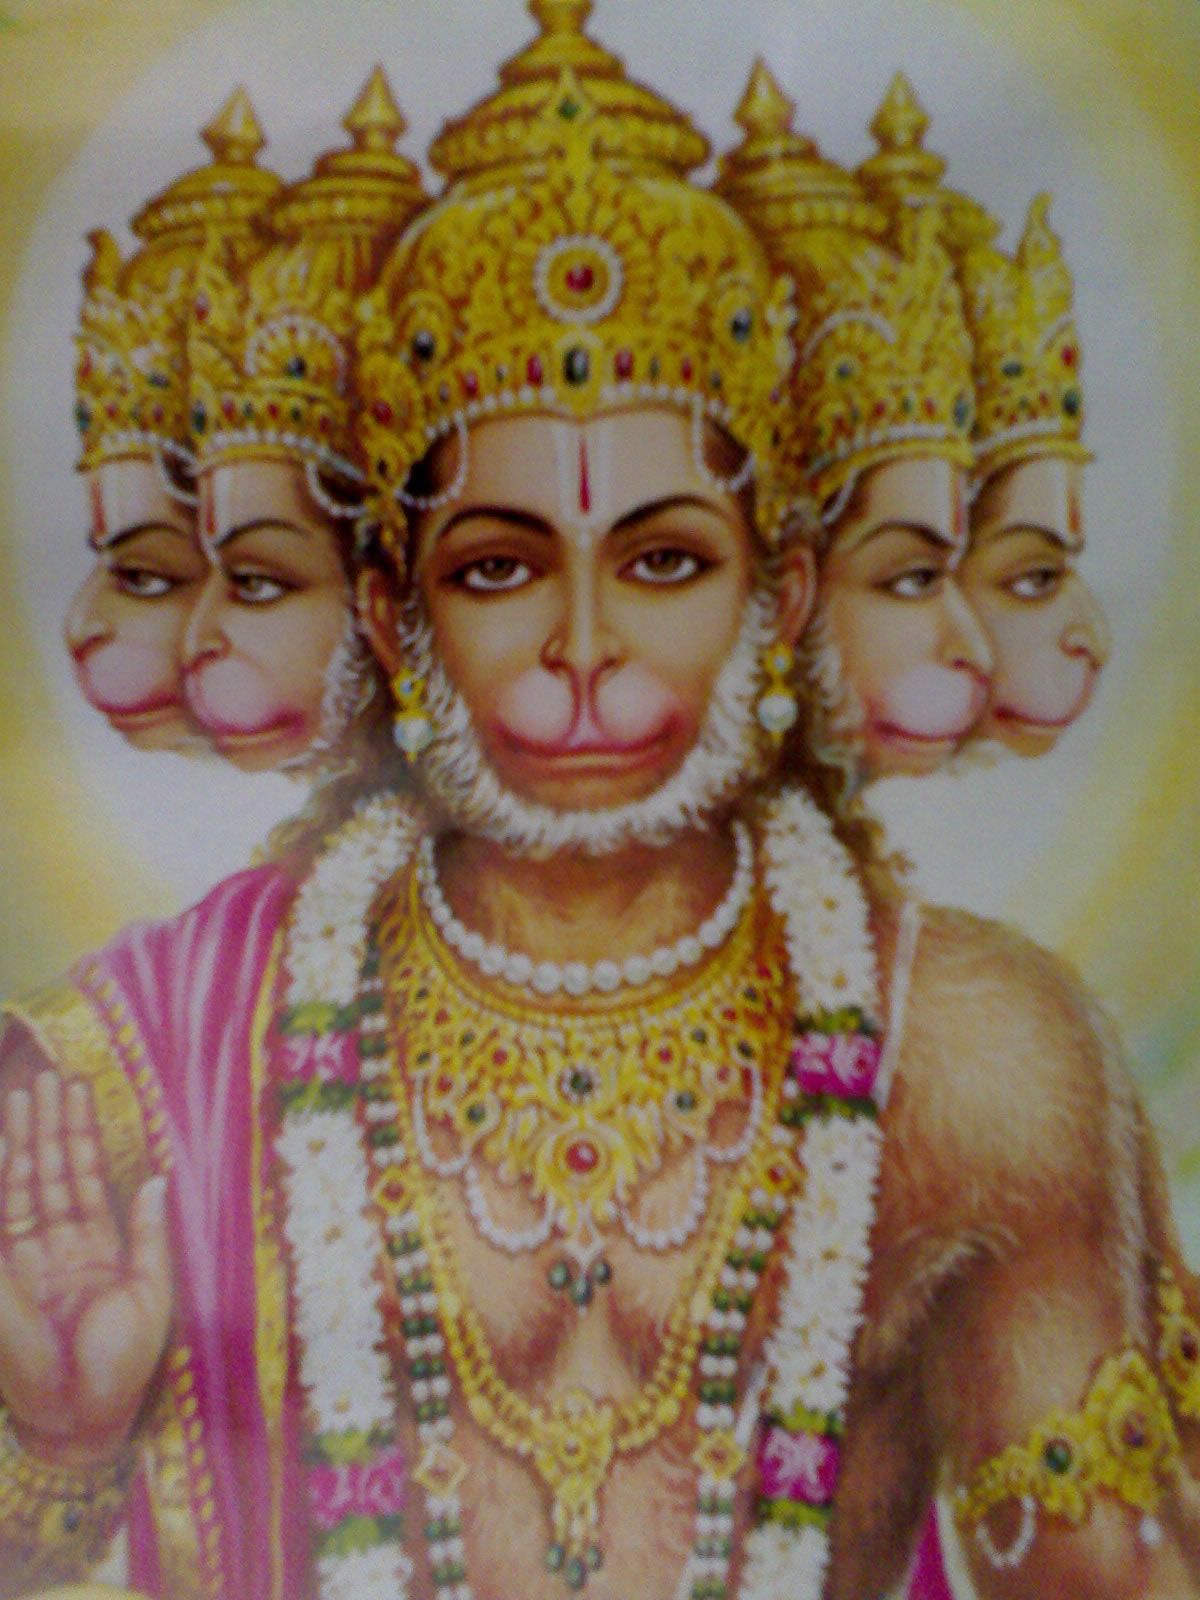 http://3.bp.blogspot.com/_WOWQJUlRtKQ/TROa5I343GI/AAAAAAAABBY/LRcpZ1vVQiQ/s1600/Panchmukhi+Hanuman+Wallpaper+3.jpg